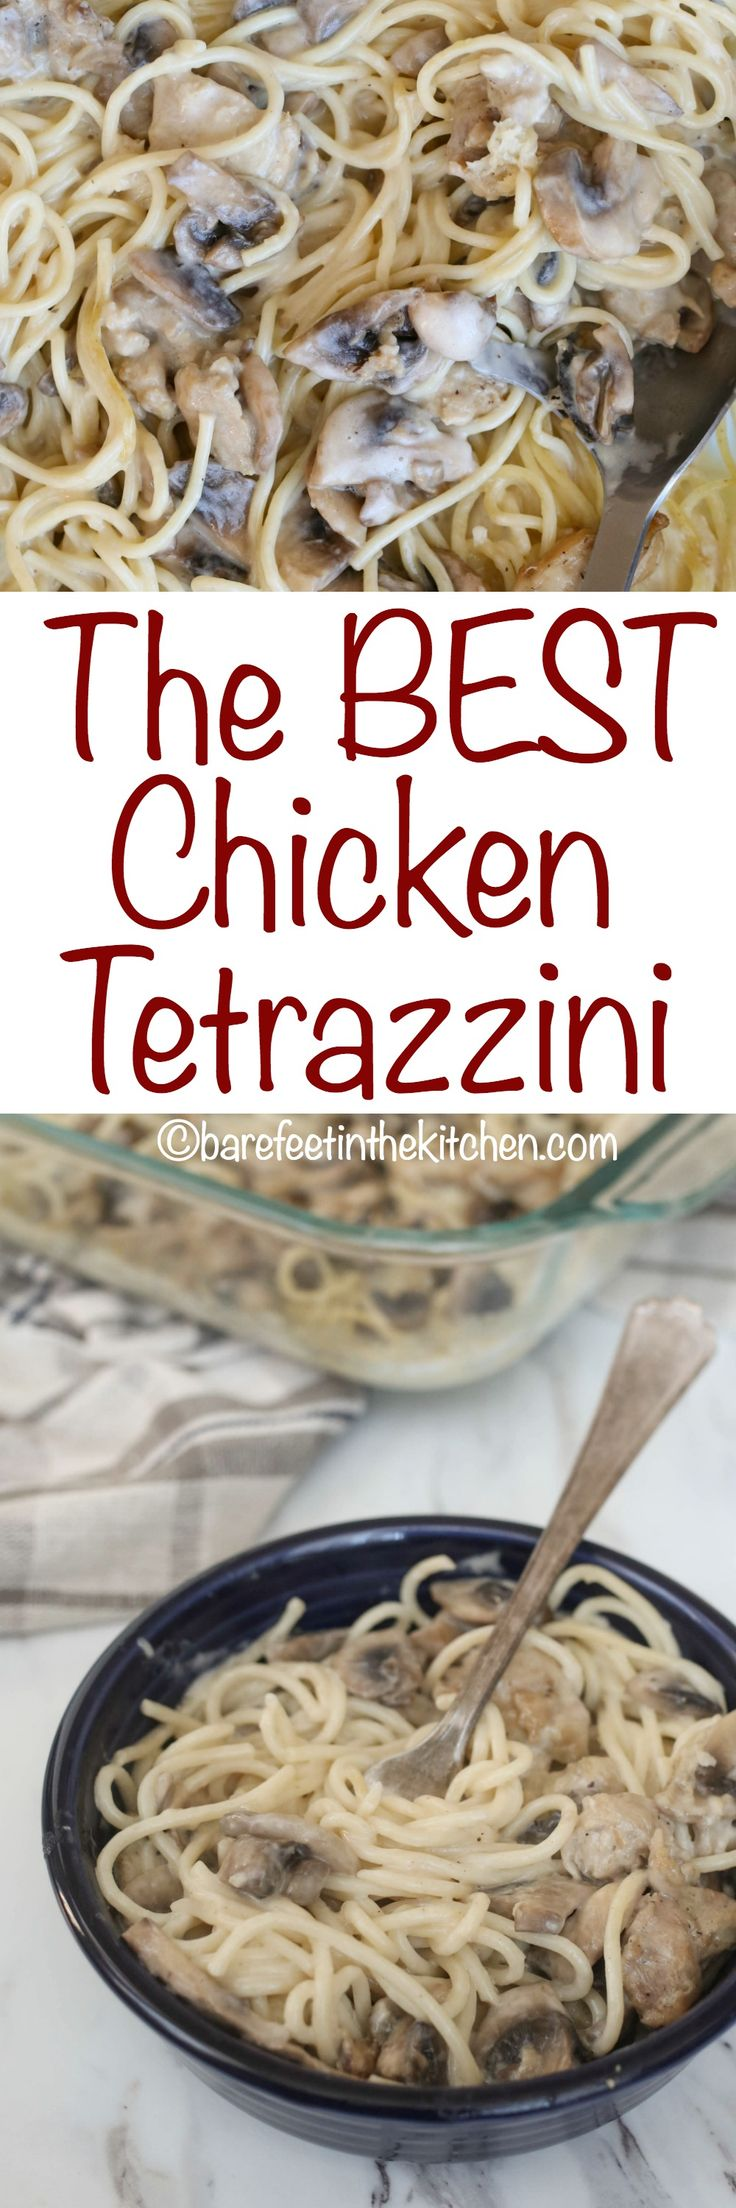 The BEST Chicken Tetrazzini - get the recipe at barefeetinthekitchen.com